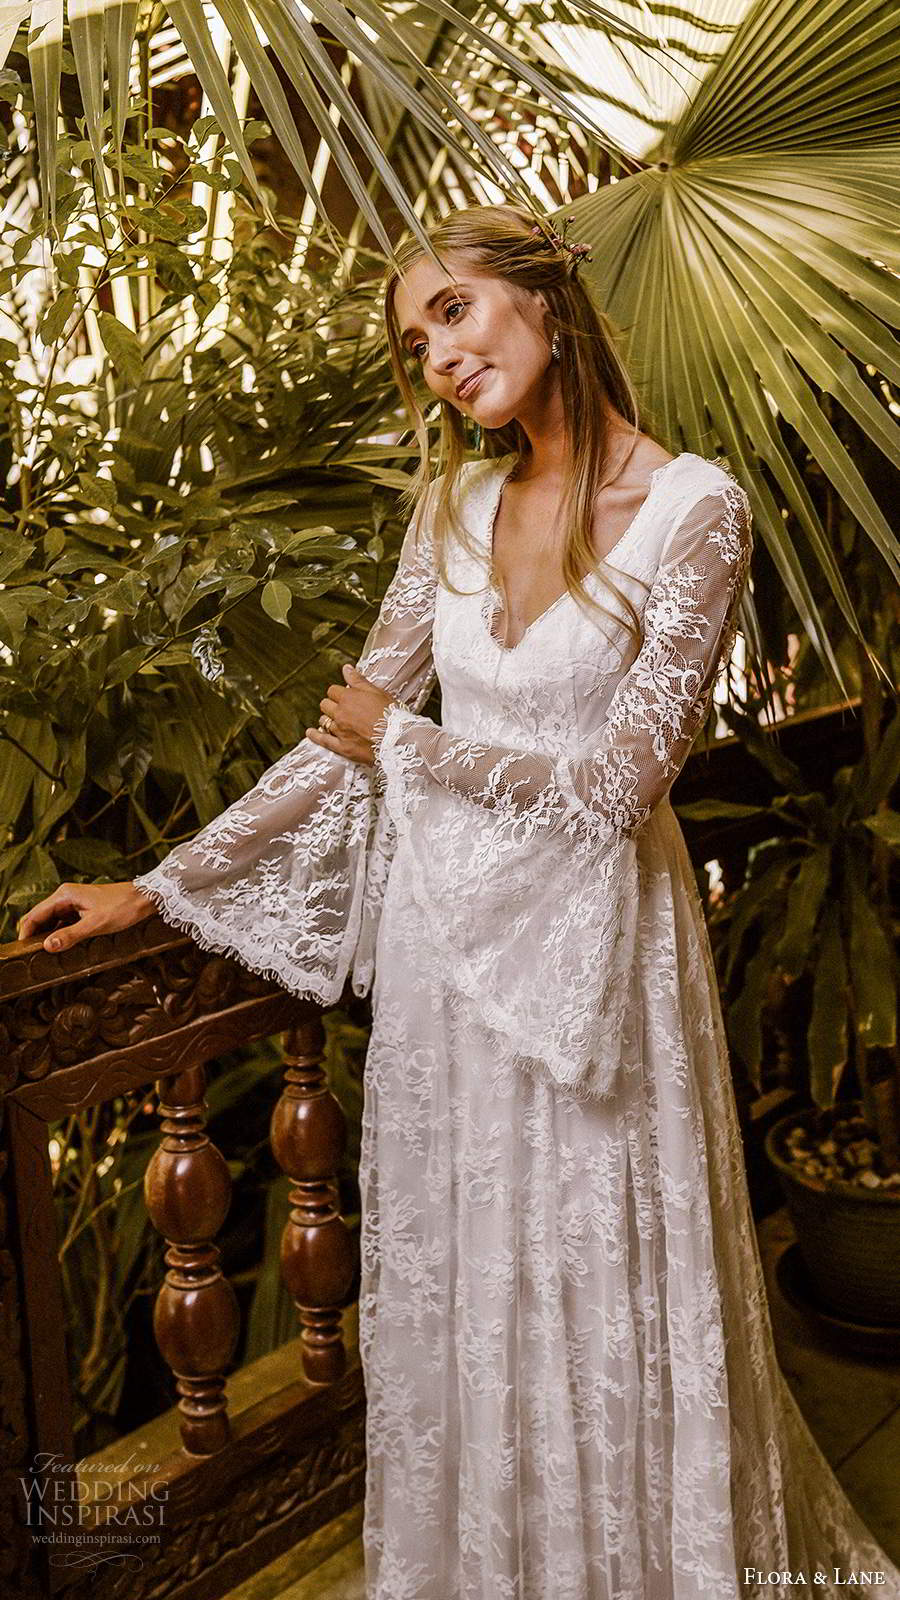 flora and lane 2019 bridal long flare sleeves v neckline fully embellished lace boho romantic a line wedding dress v back chapel train (3) mv